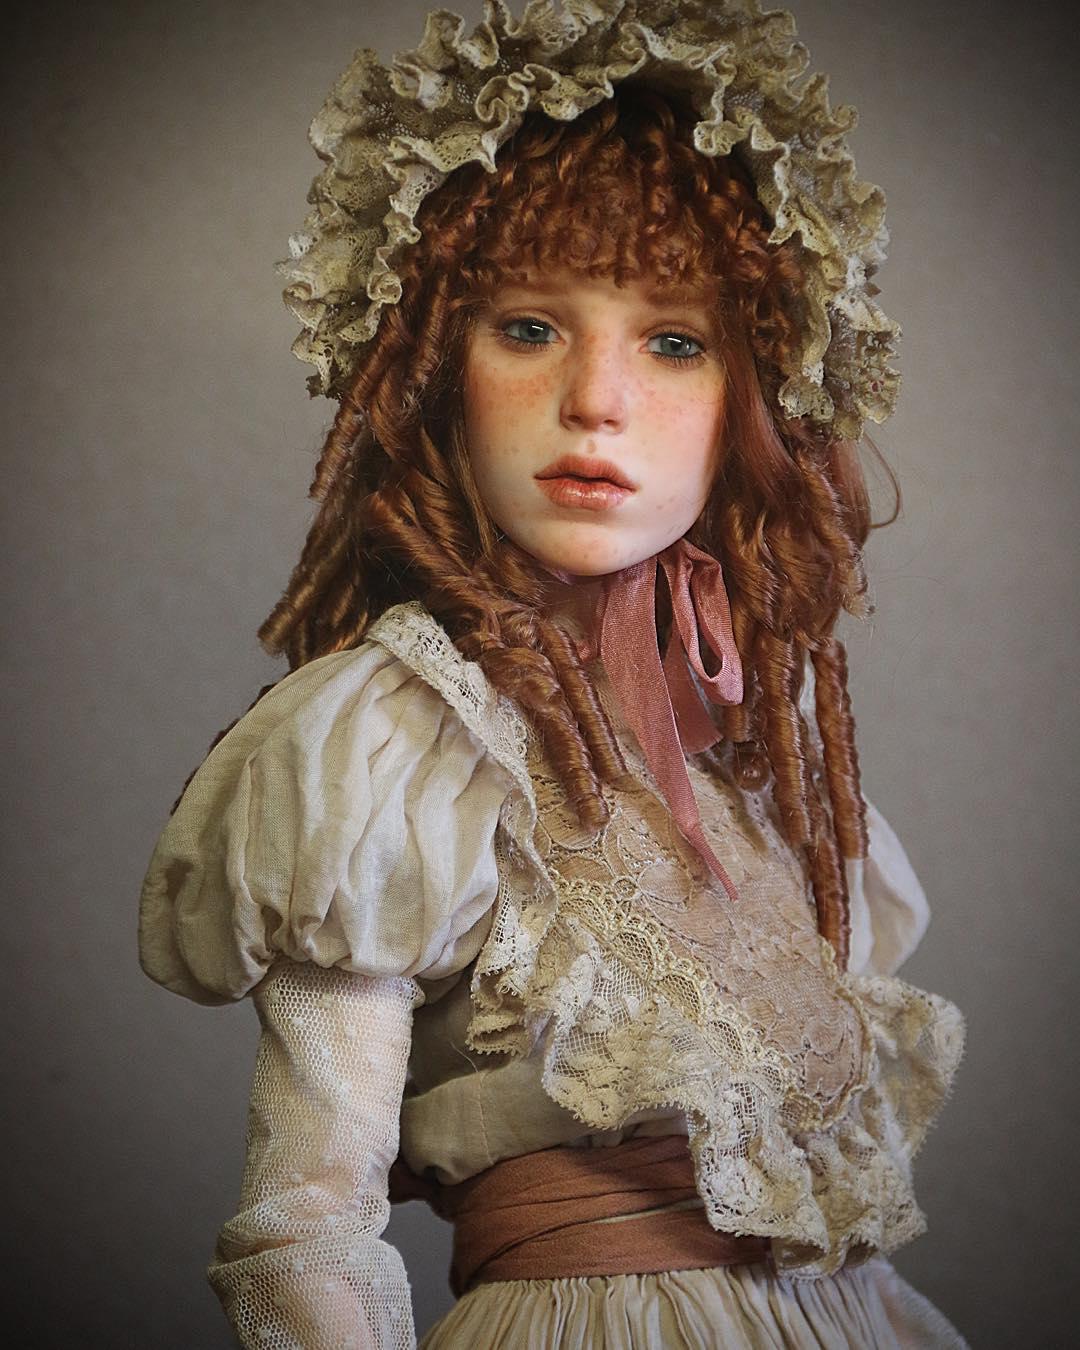 rostos-de-bonecas-realistas-4